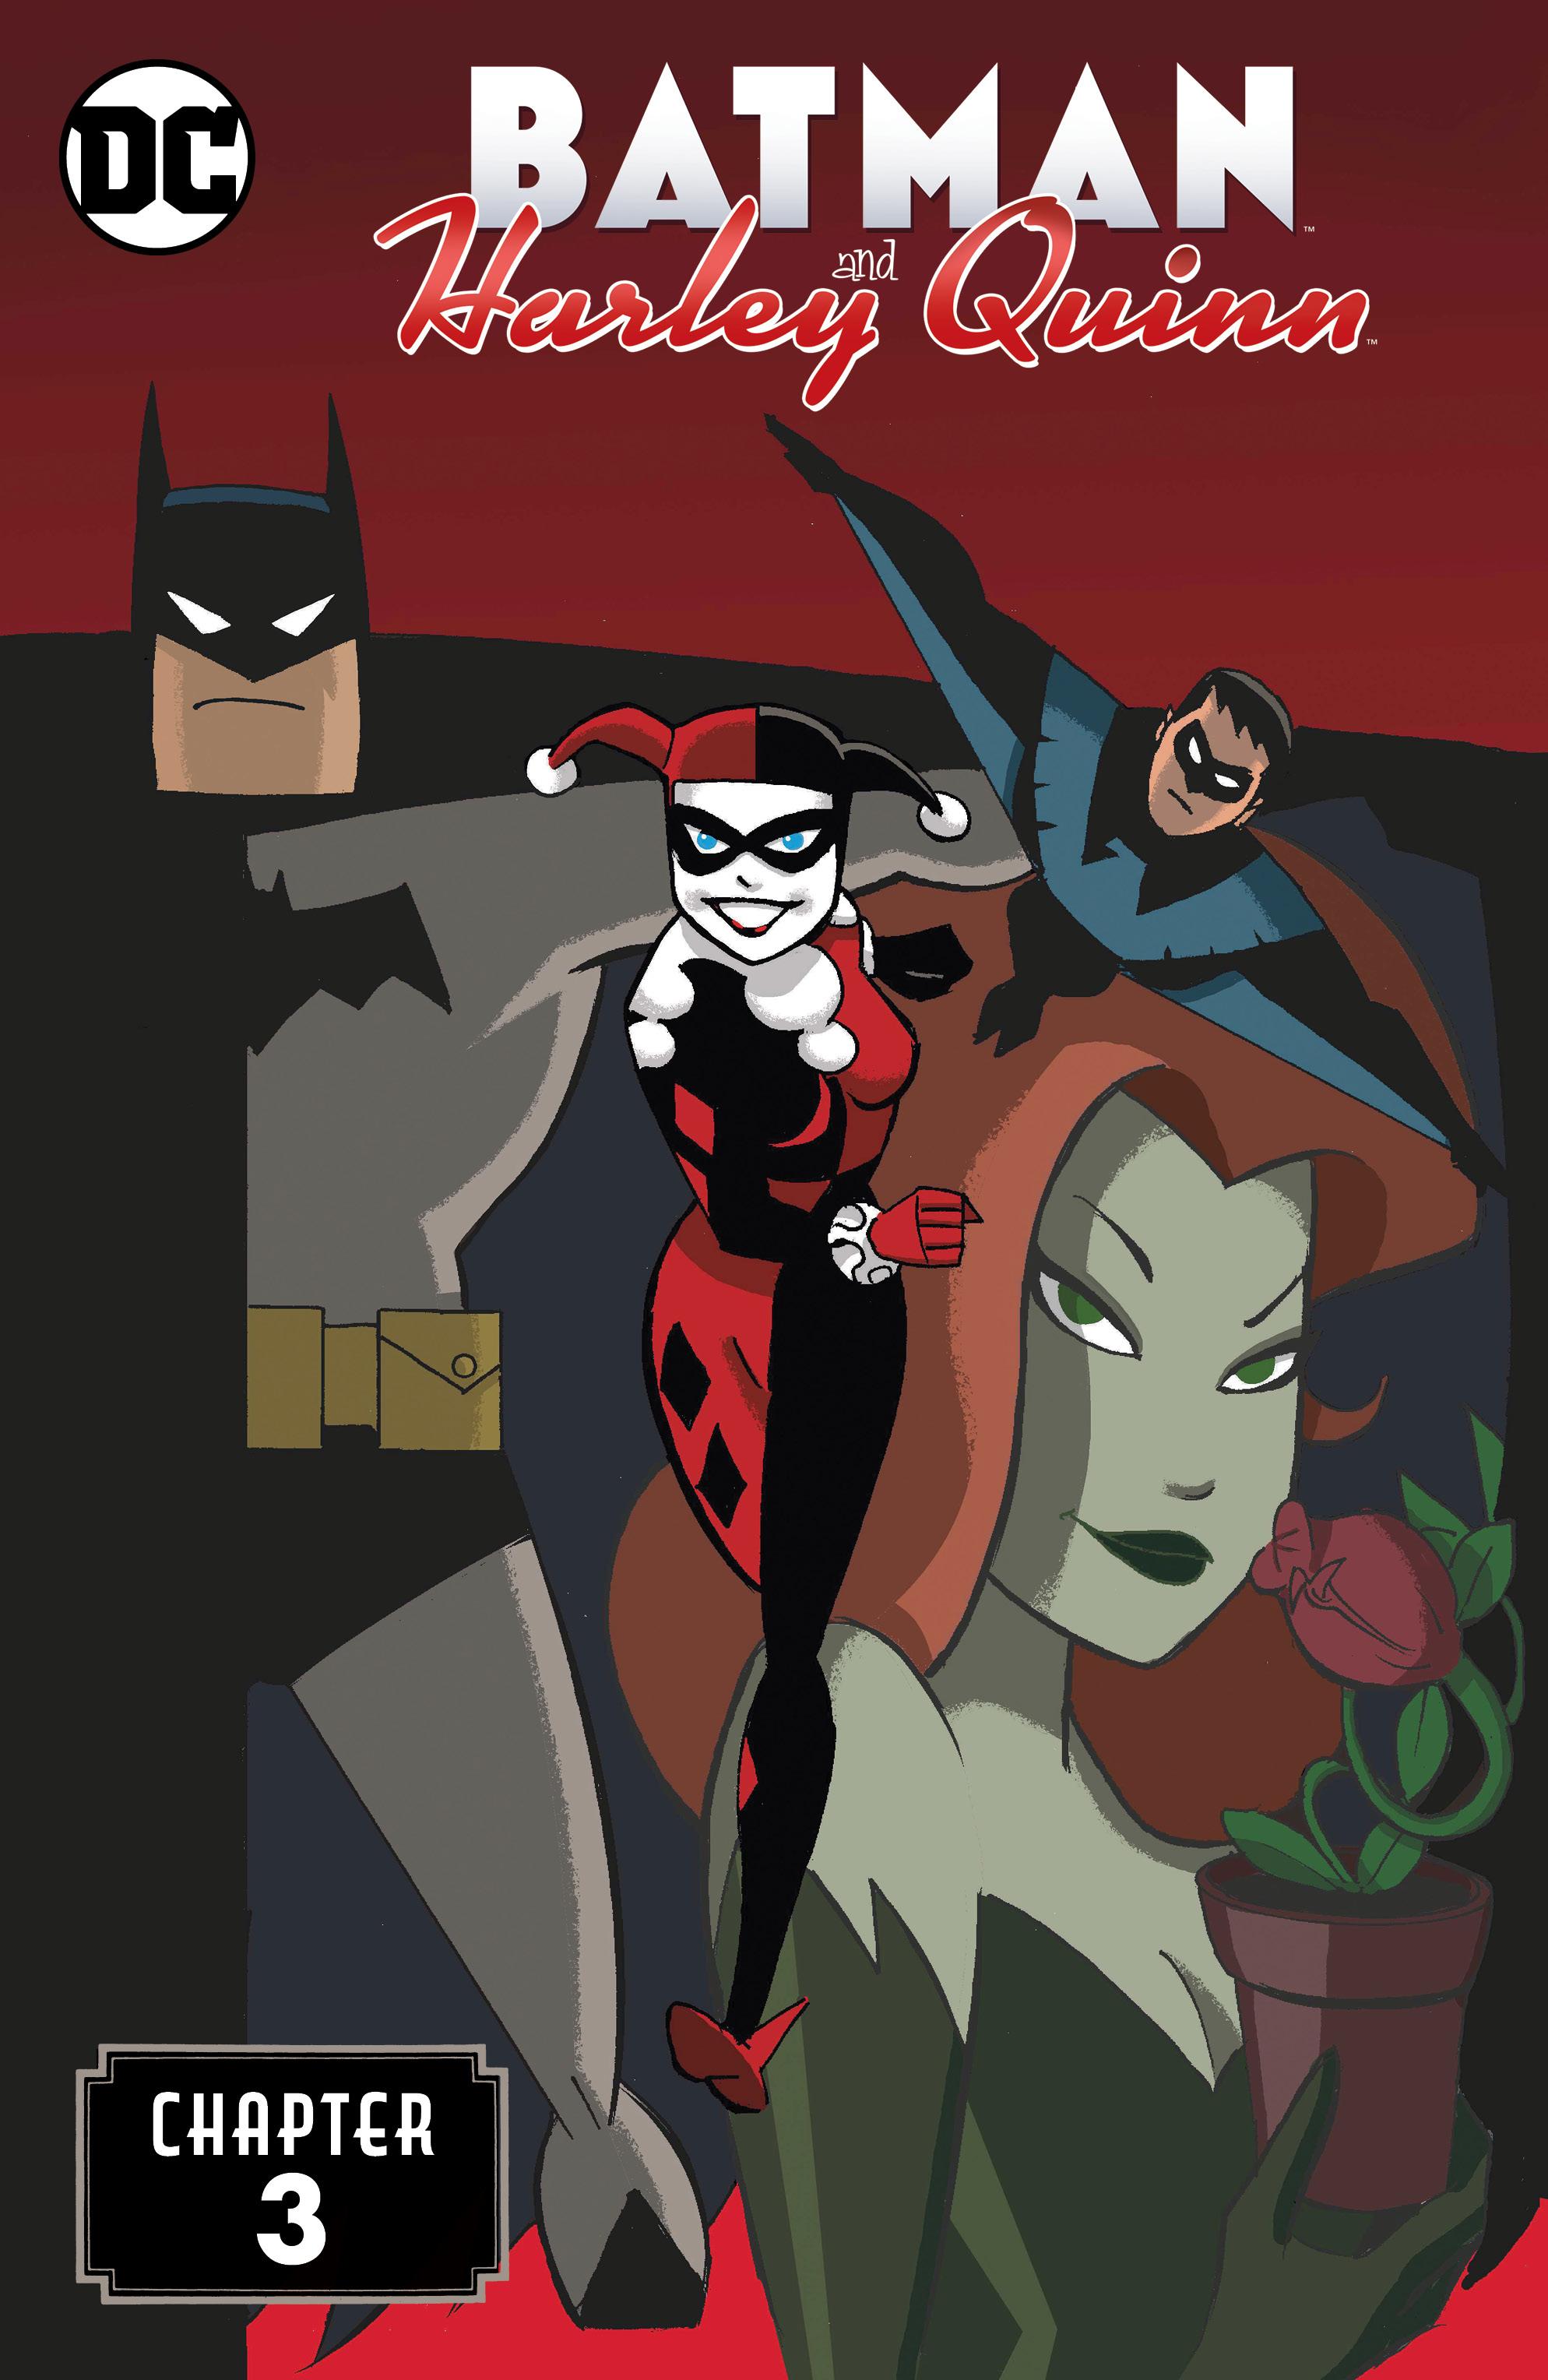 Batman and Harley Quinn Vol 1 3 (Digital)